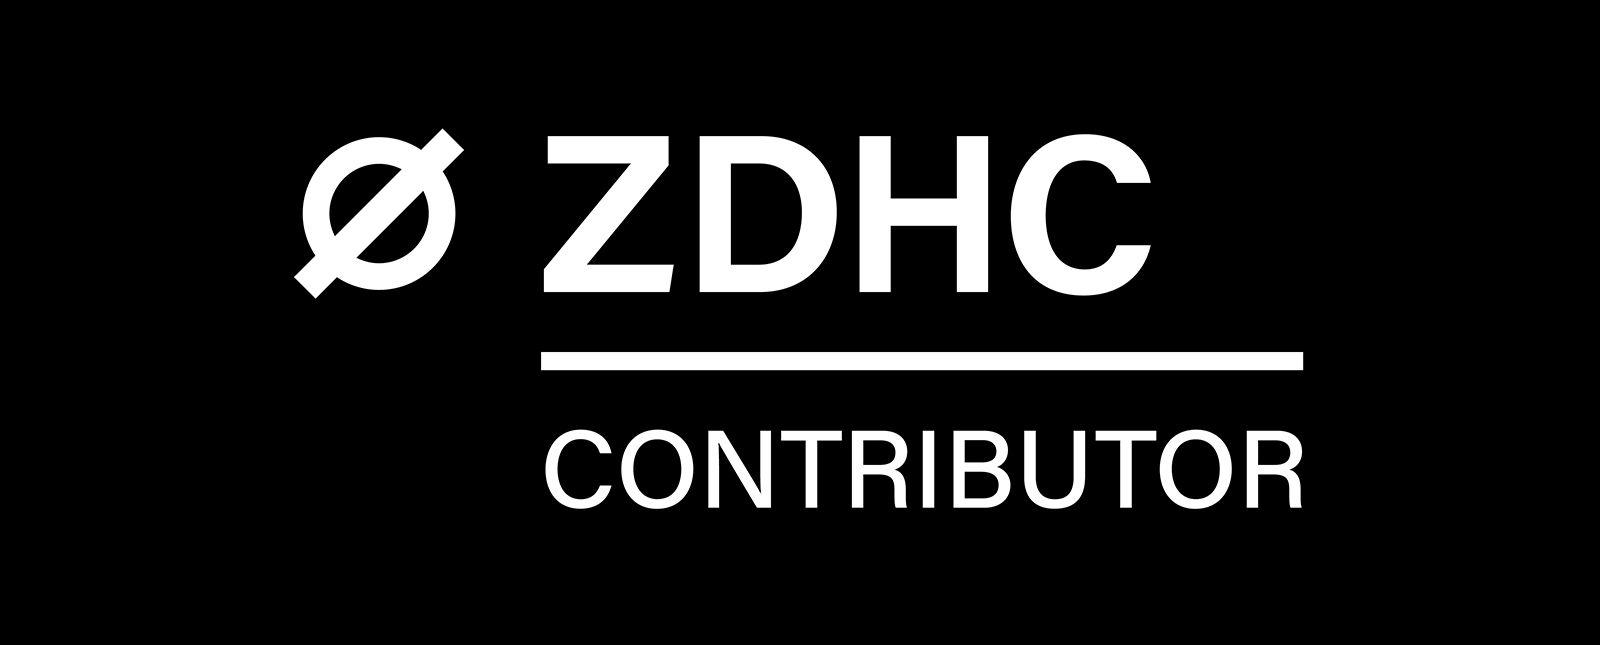 ZDHC CONTRIBUTOR